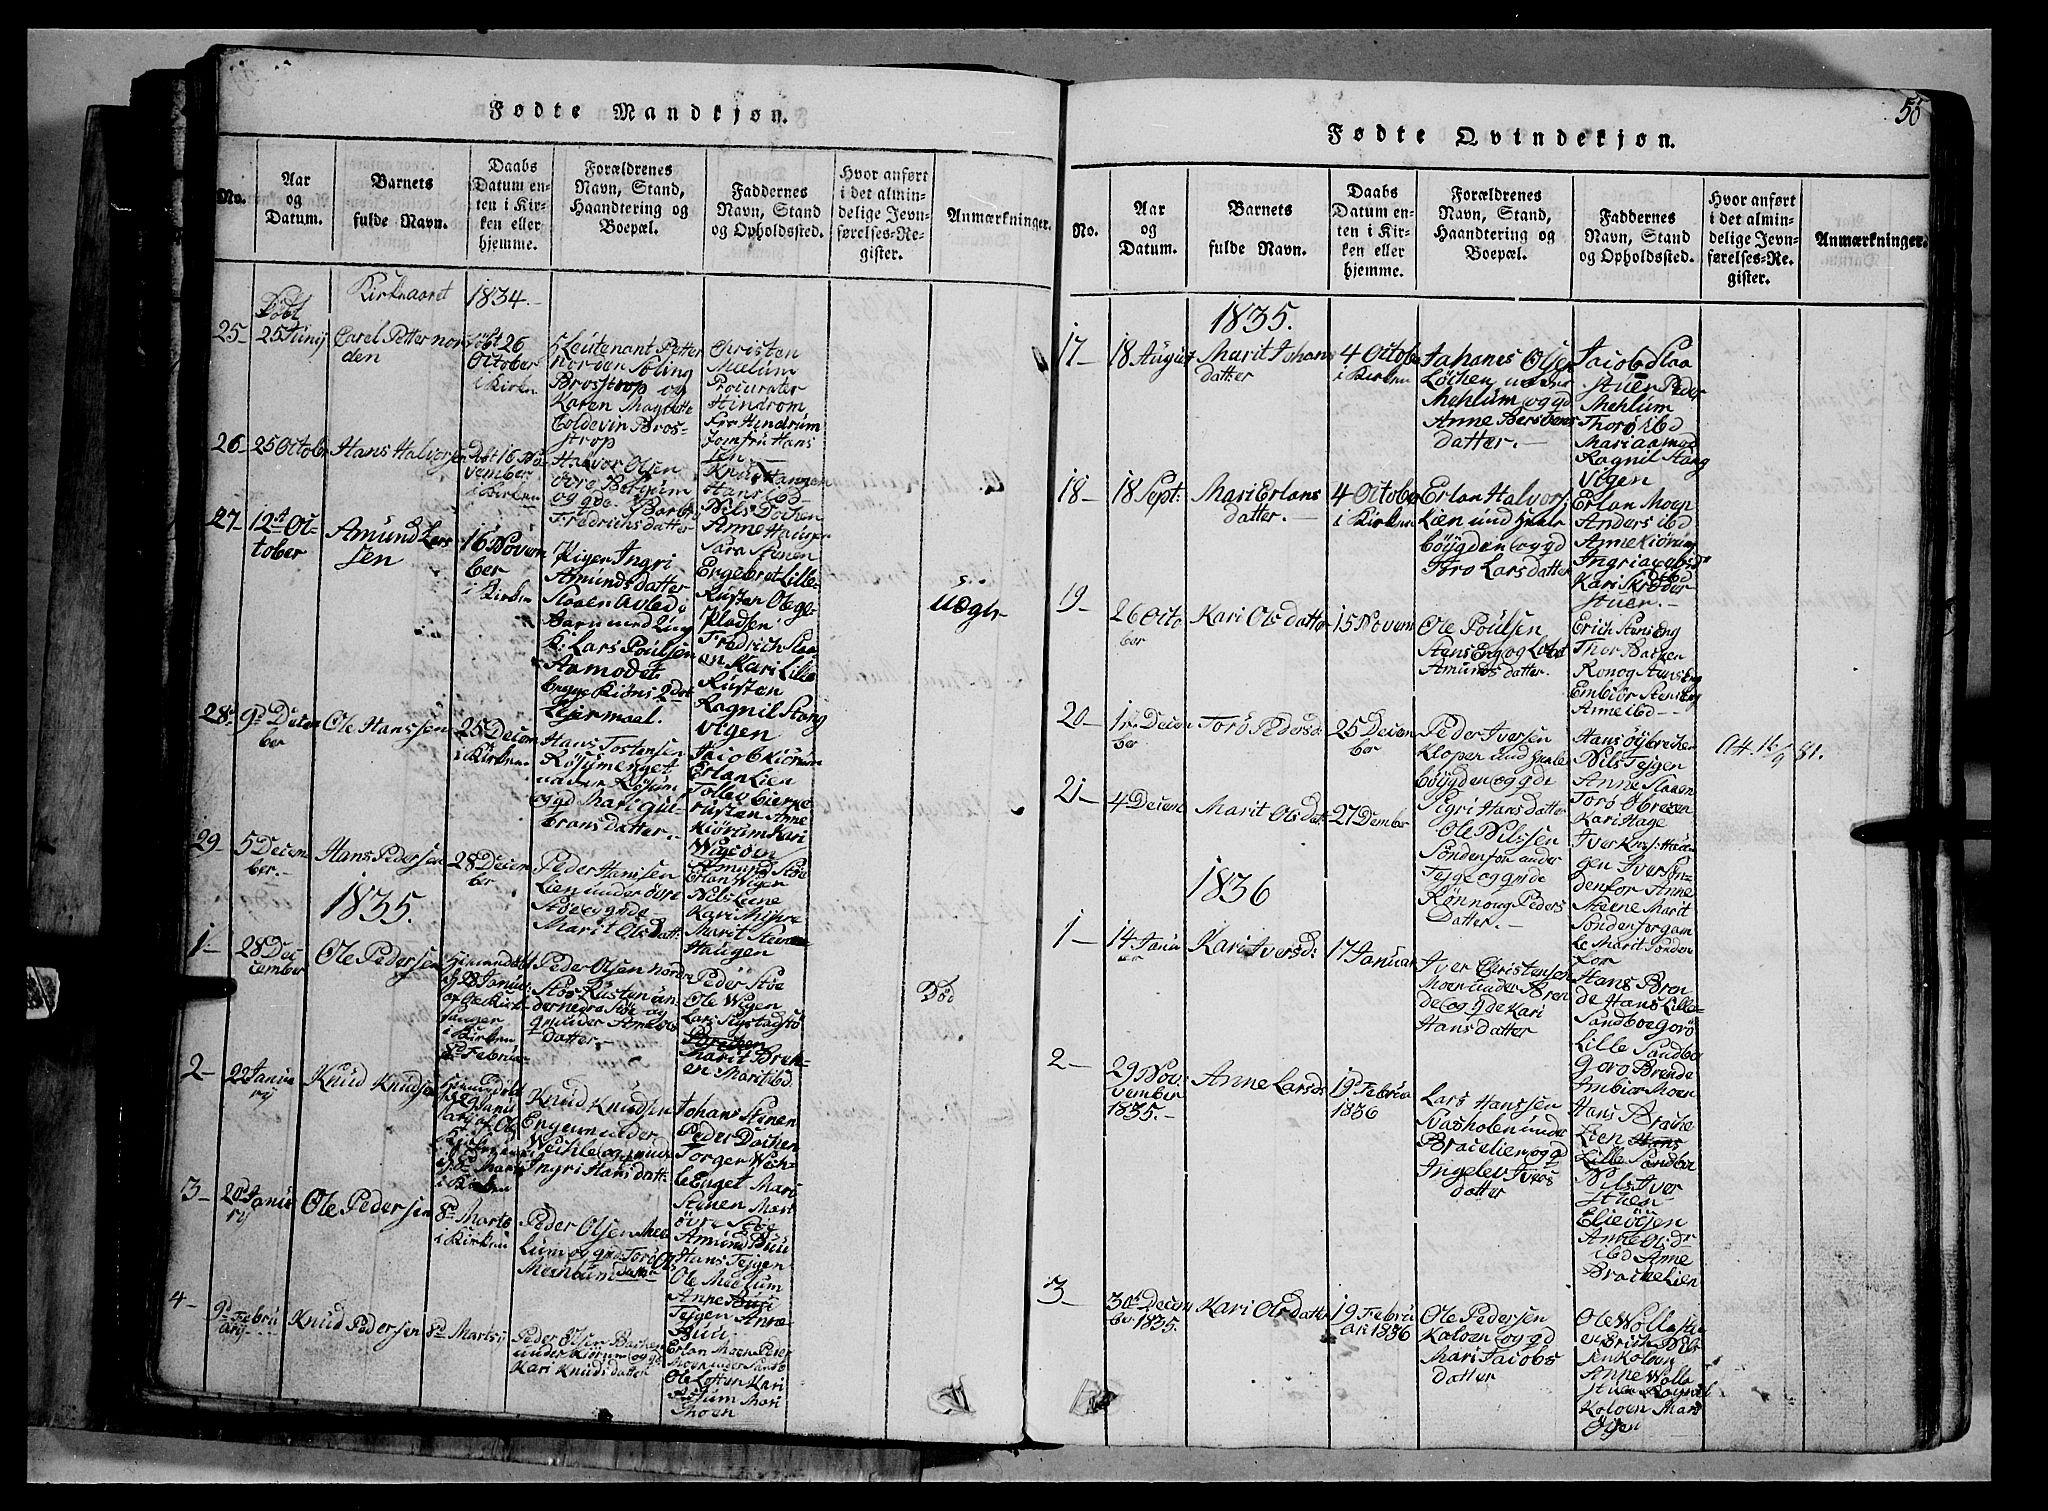 SAH, Fron prestekontor, H/Ha/Hab/L0002: Klokkerbok nr. 2, 1816-1850, s. 50